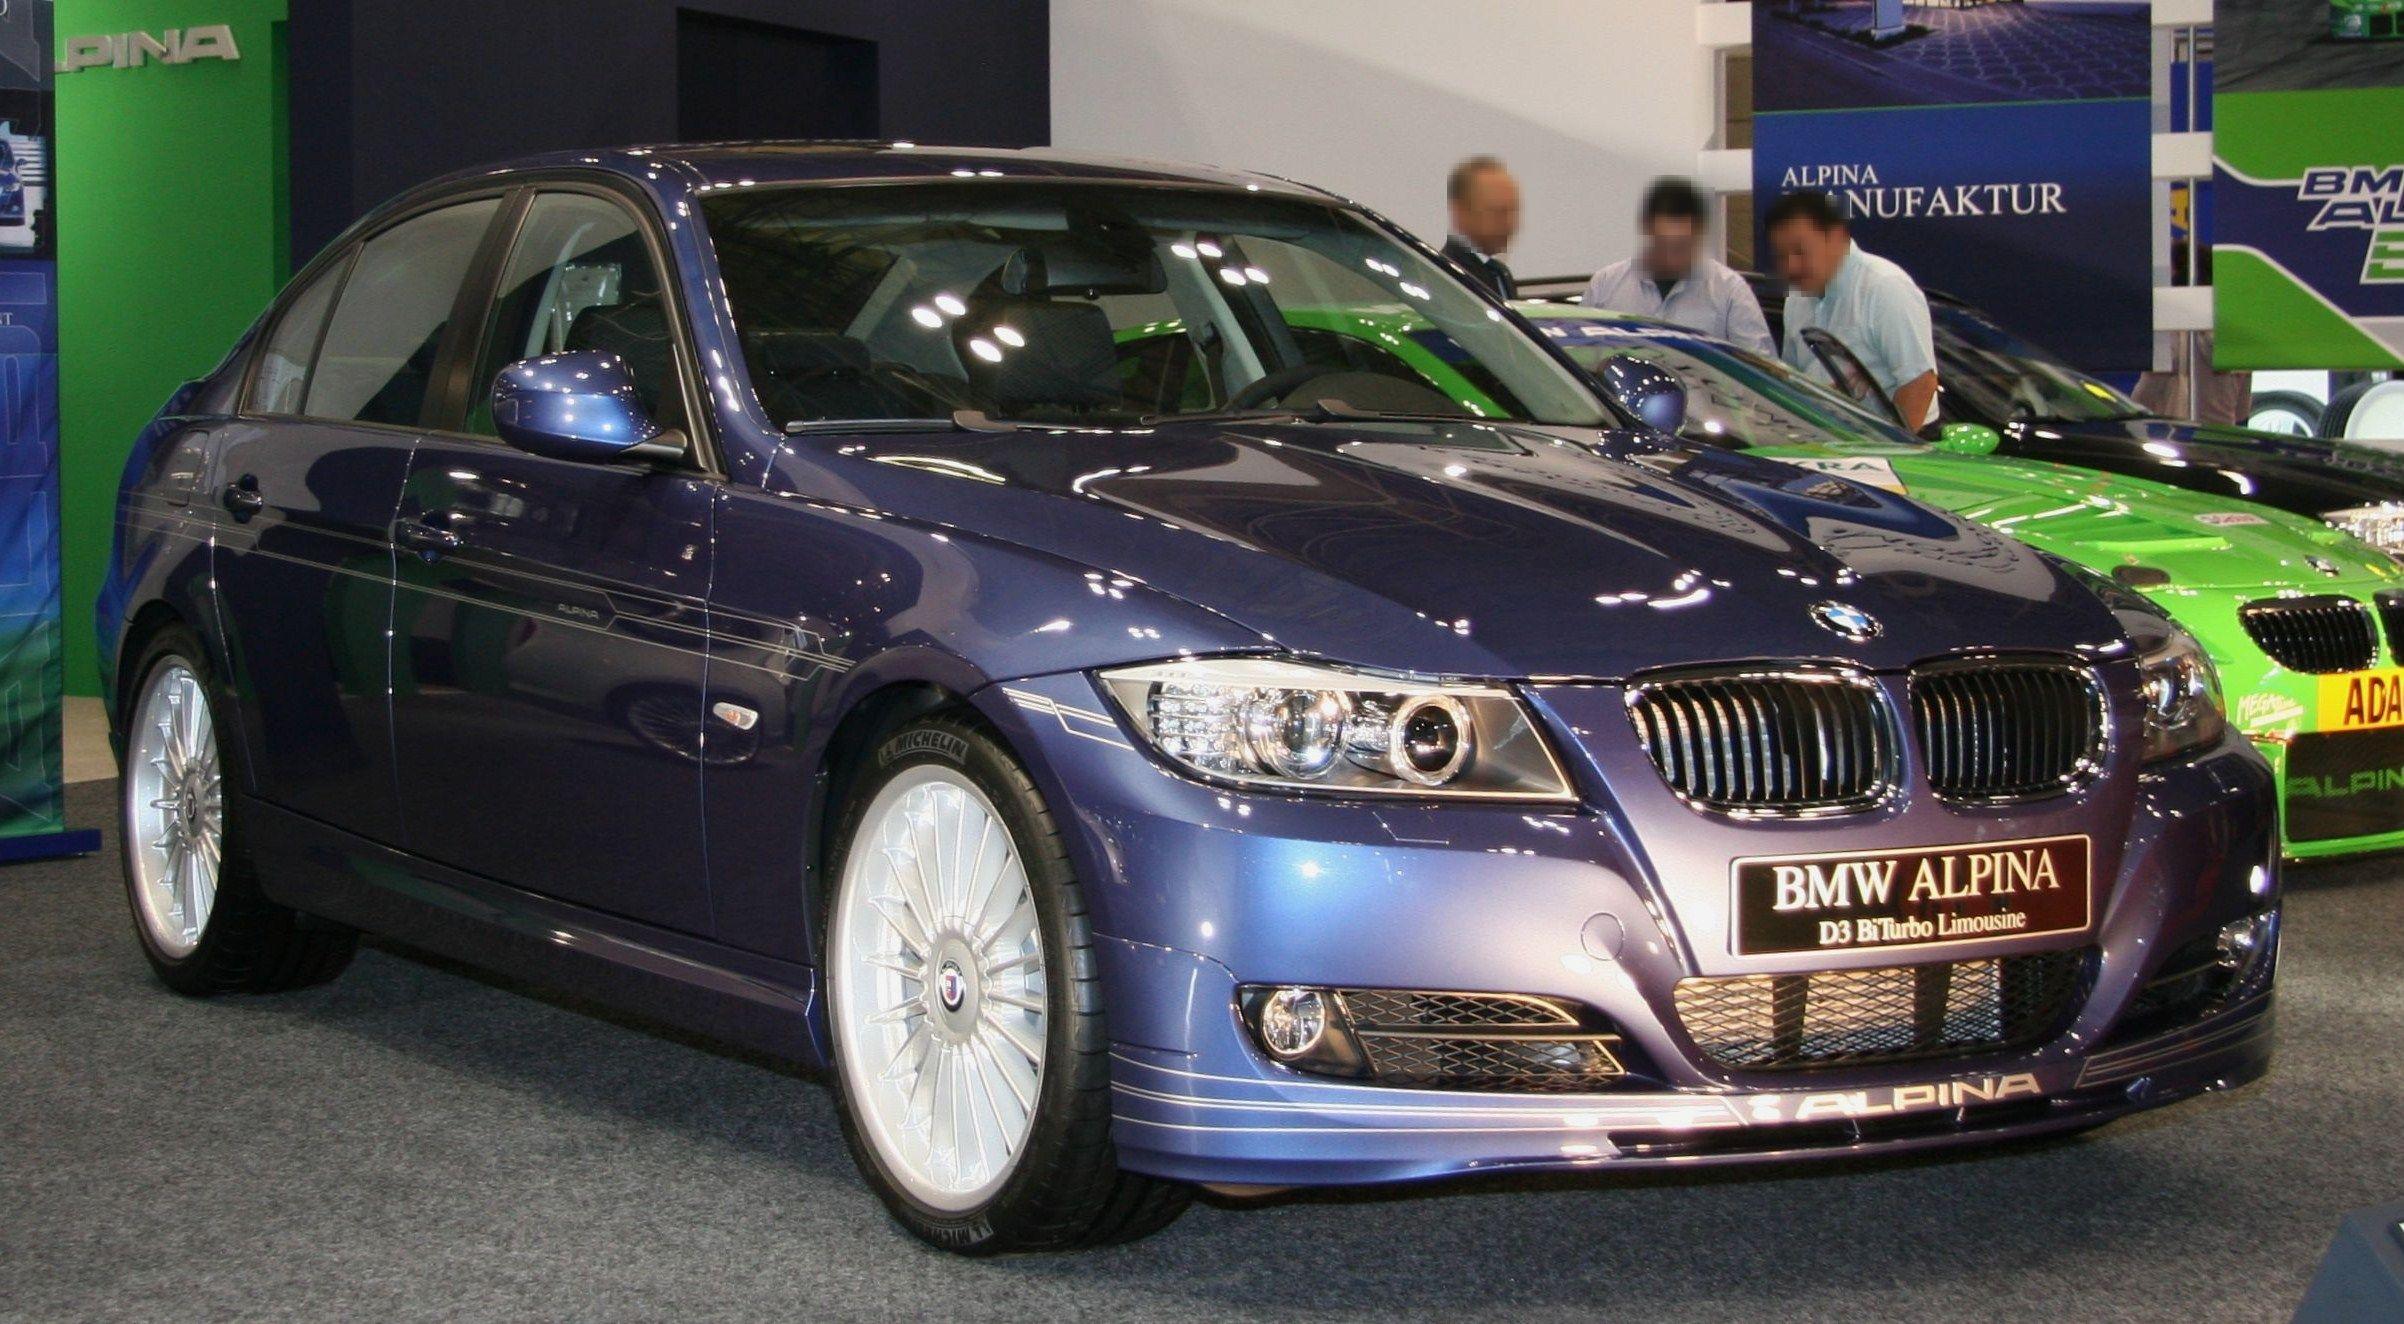 File:BMW Alpina D3 BiTurbo Limousine.jpg - Wikimedia Commons